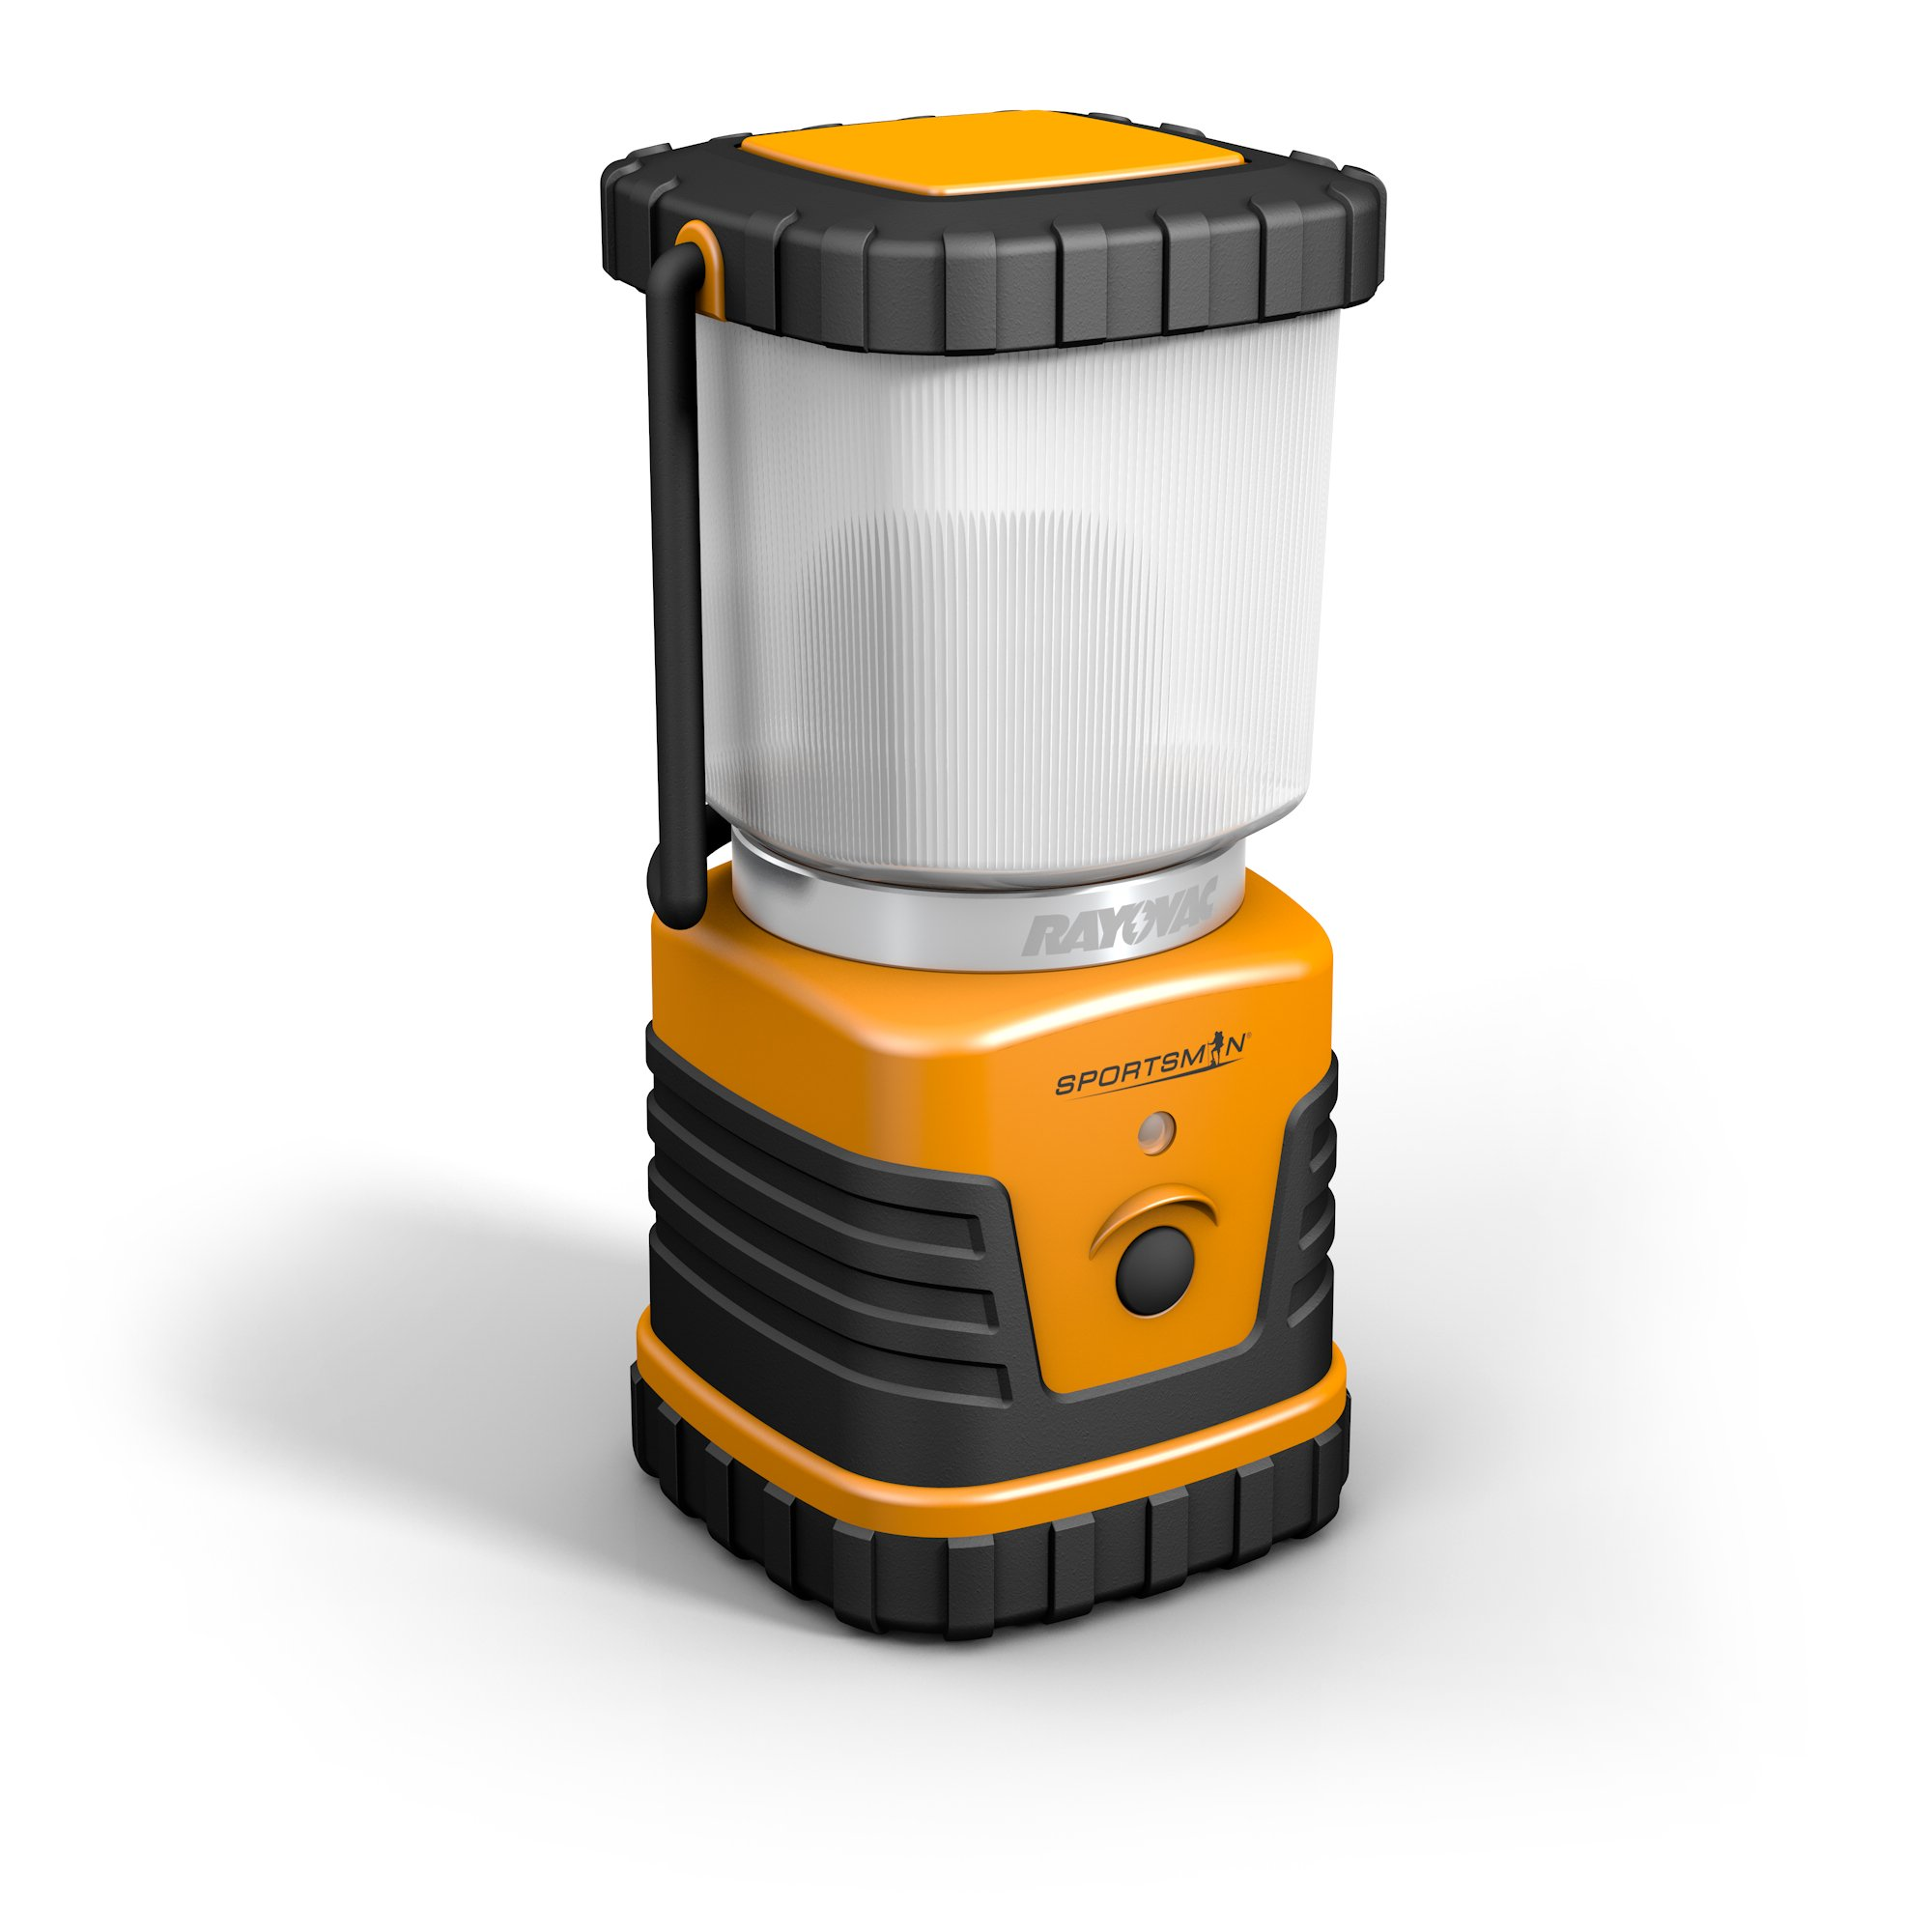 Rayovac SE3DLNOR Sportsman 240 Lumen 3D LED Lantern, Orange